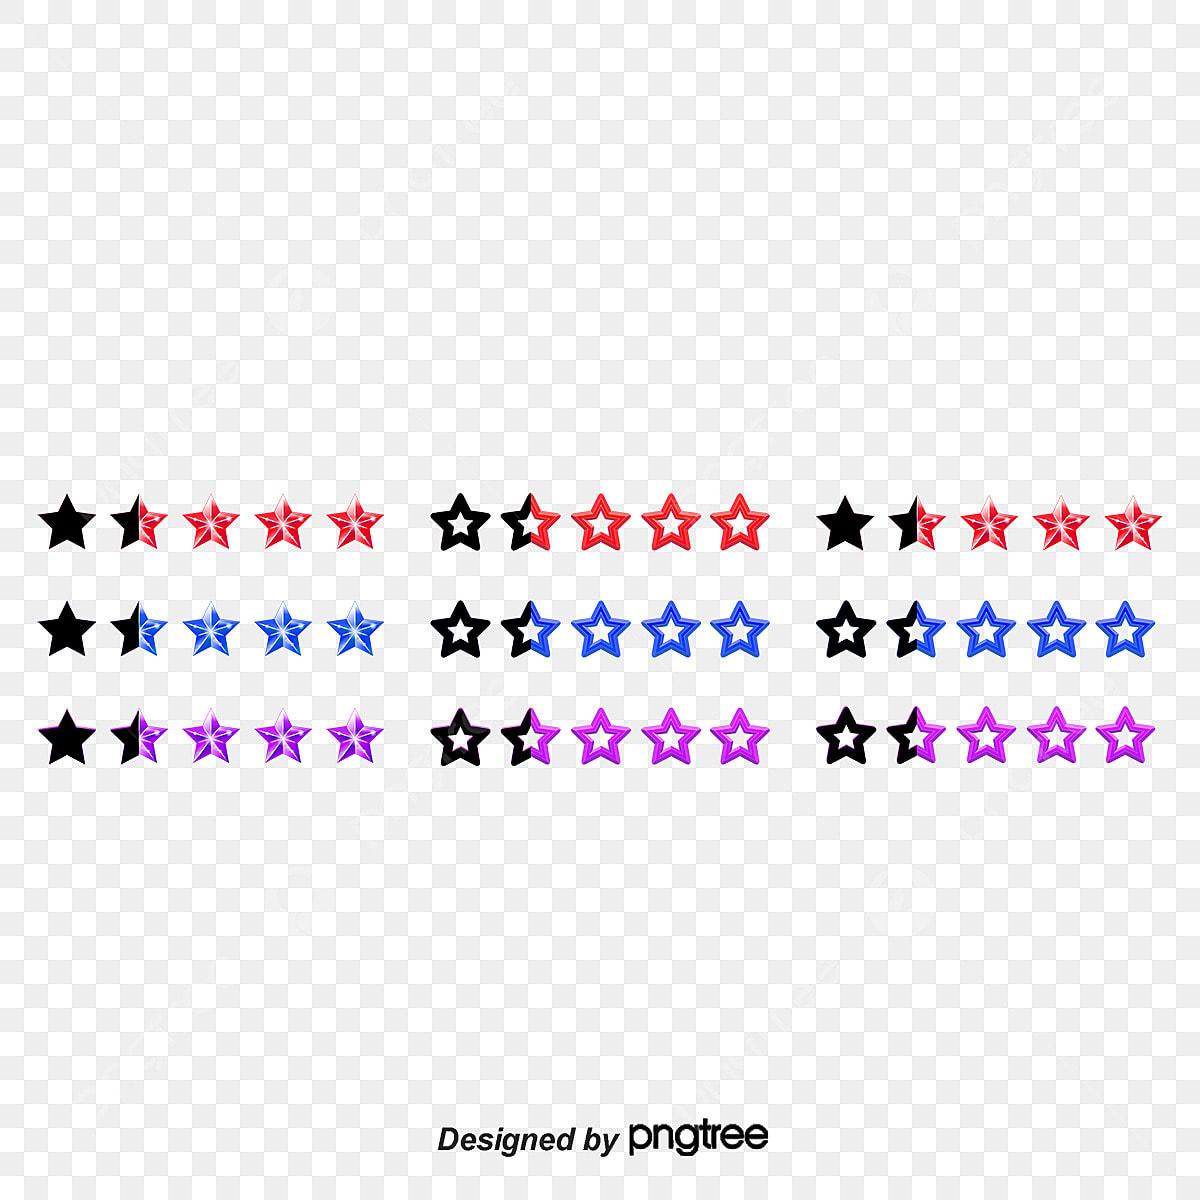 Creative Web Design Star Rating Star Rating Decoration Web